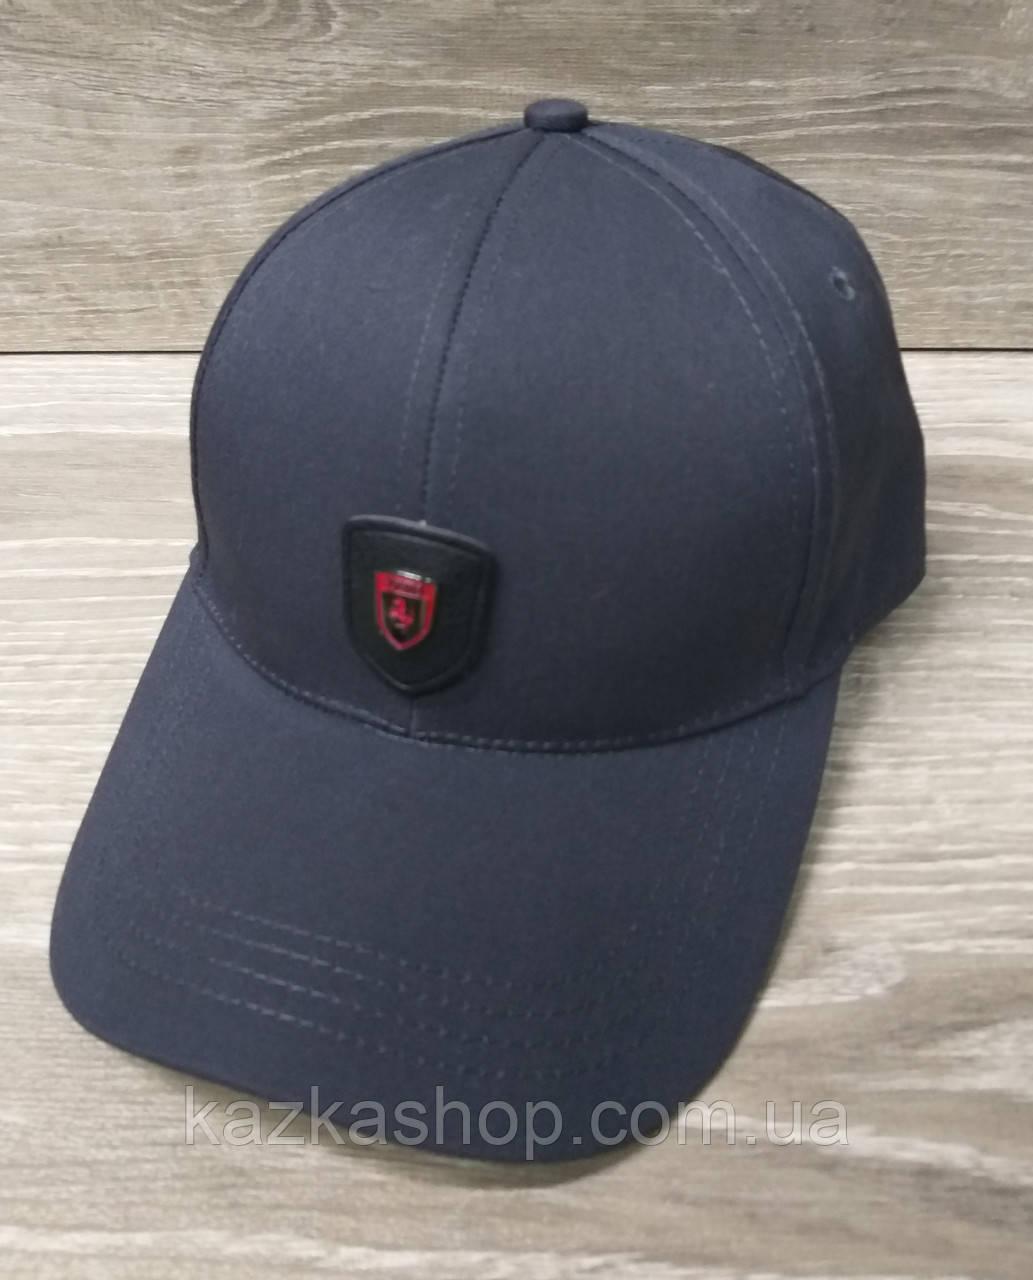 Мужская  бейсболка, кепка, со вставкой, размер 56-58, на регуляторе